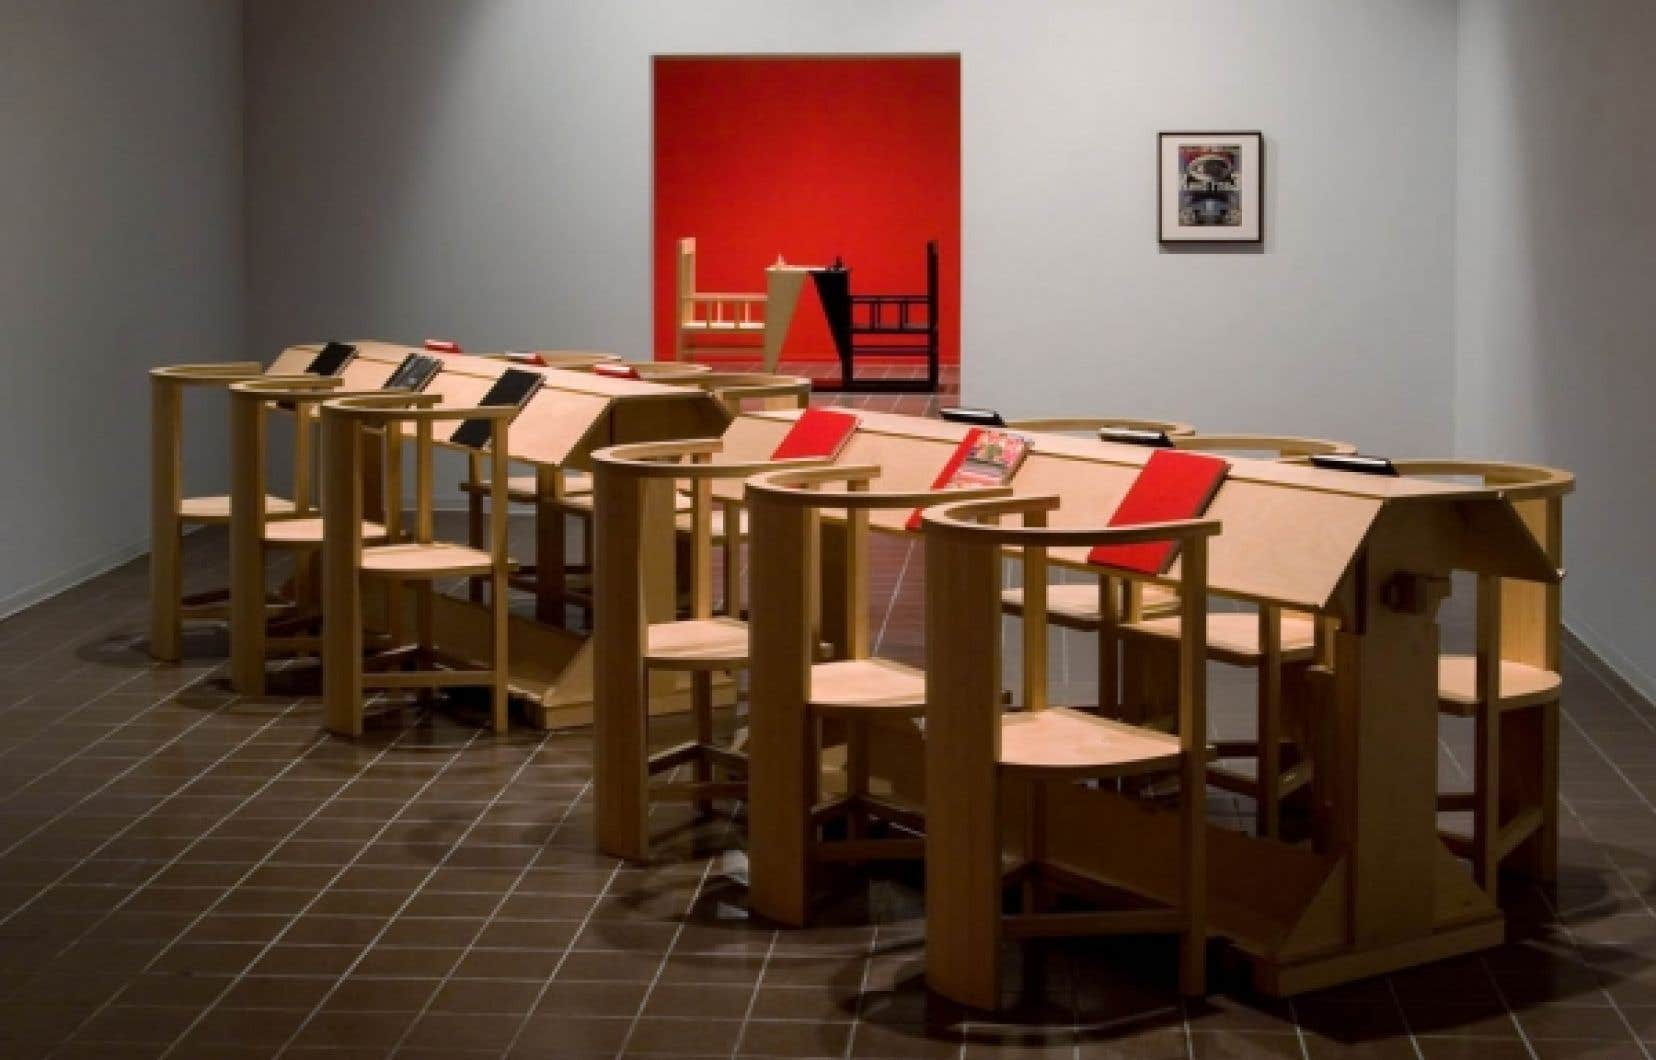 Room for the Working Artist, 2003-2004, installation d'Angela Grauerholz